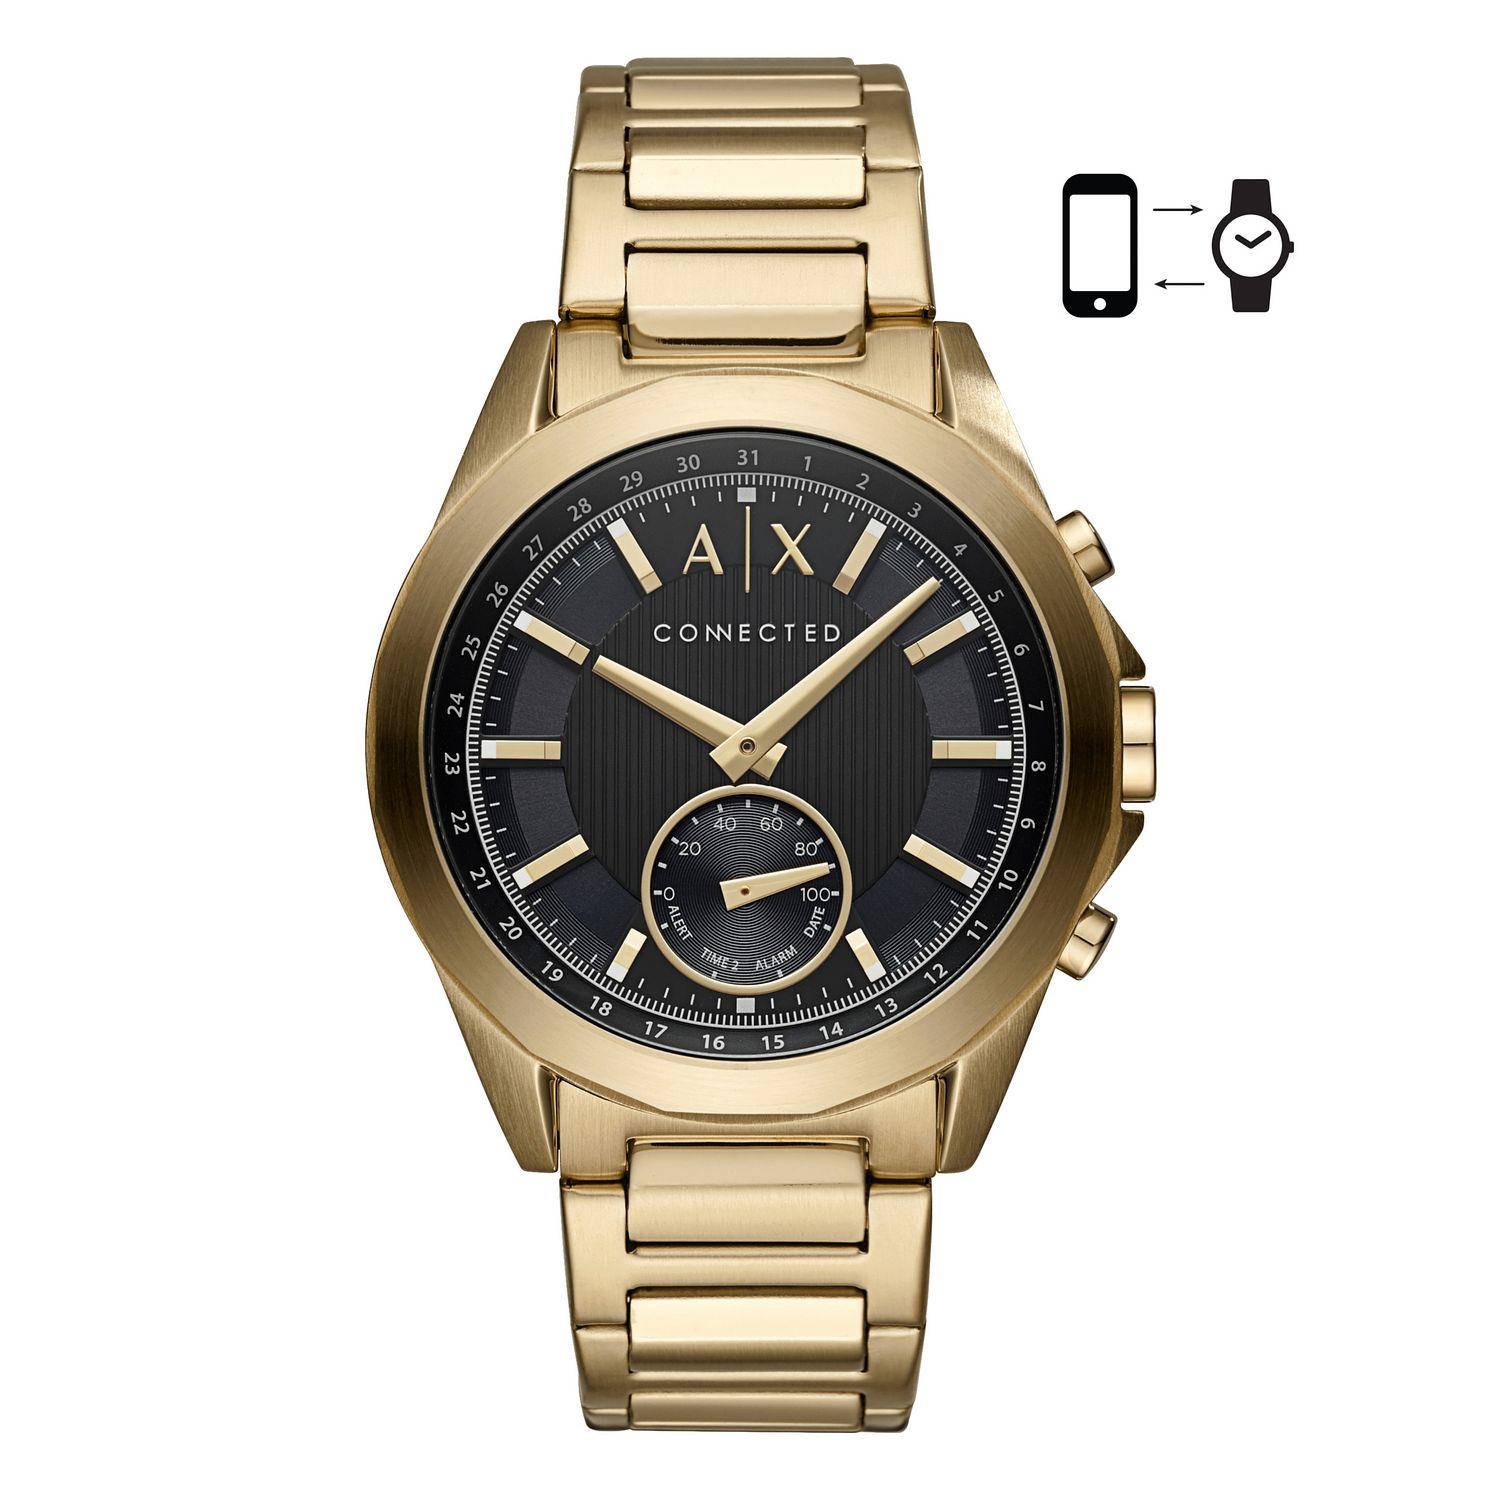 Armani Exchange Connected Hybrid Men's Watch £119 @ H Samuel